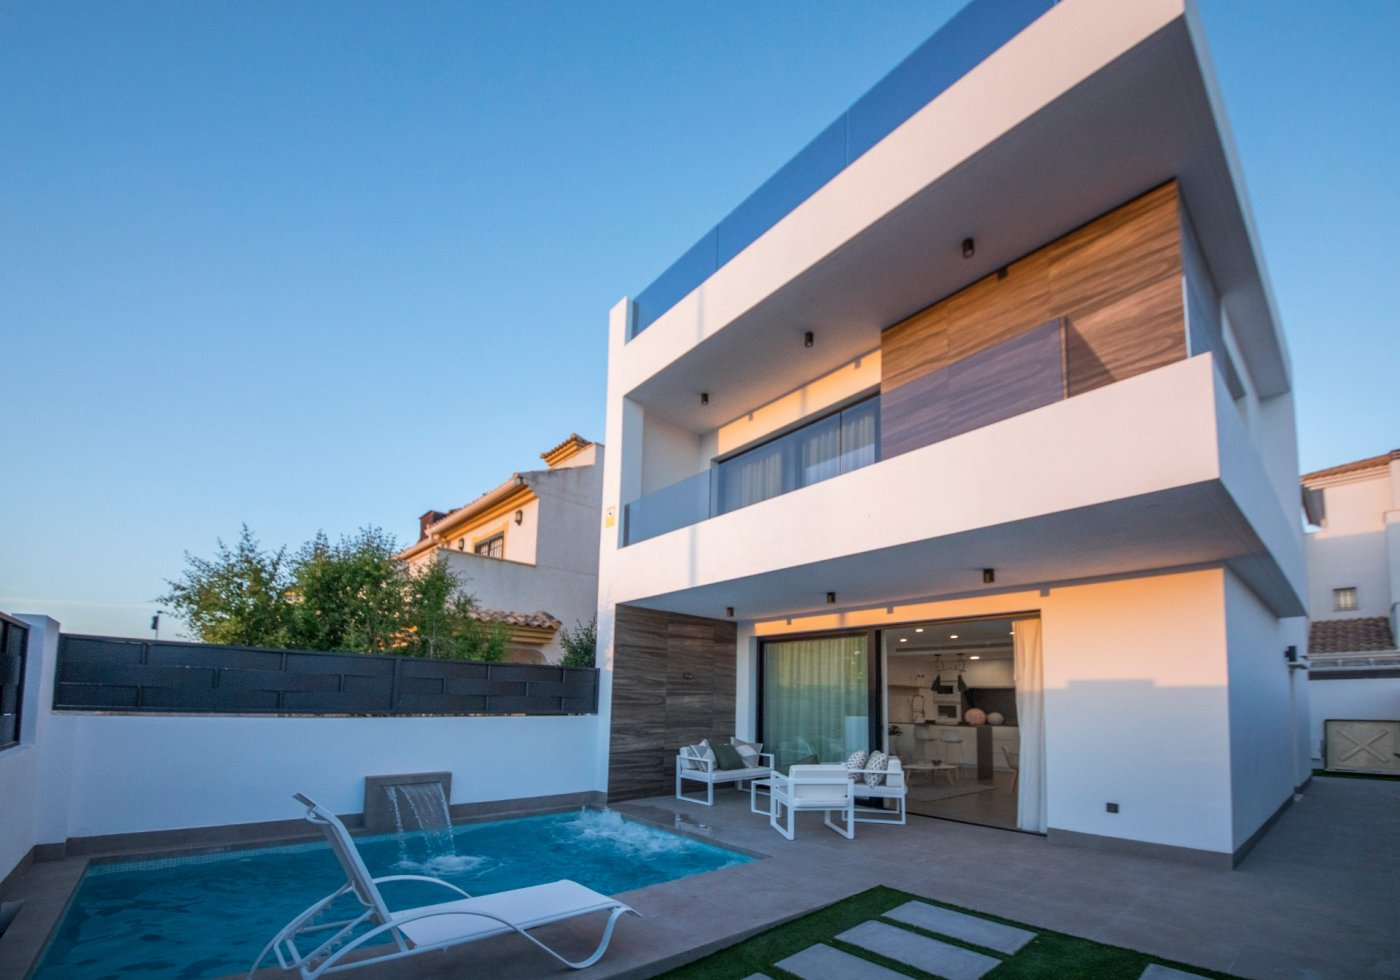 Villas - 70mmn0101